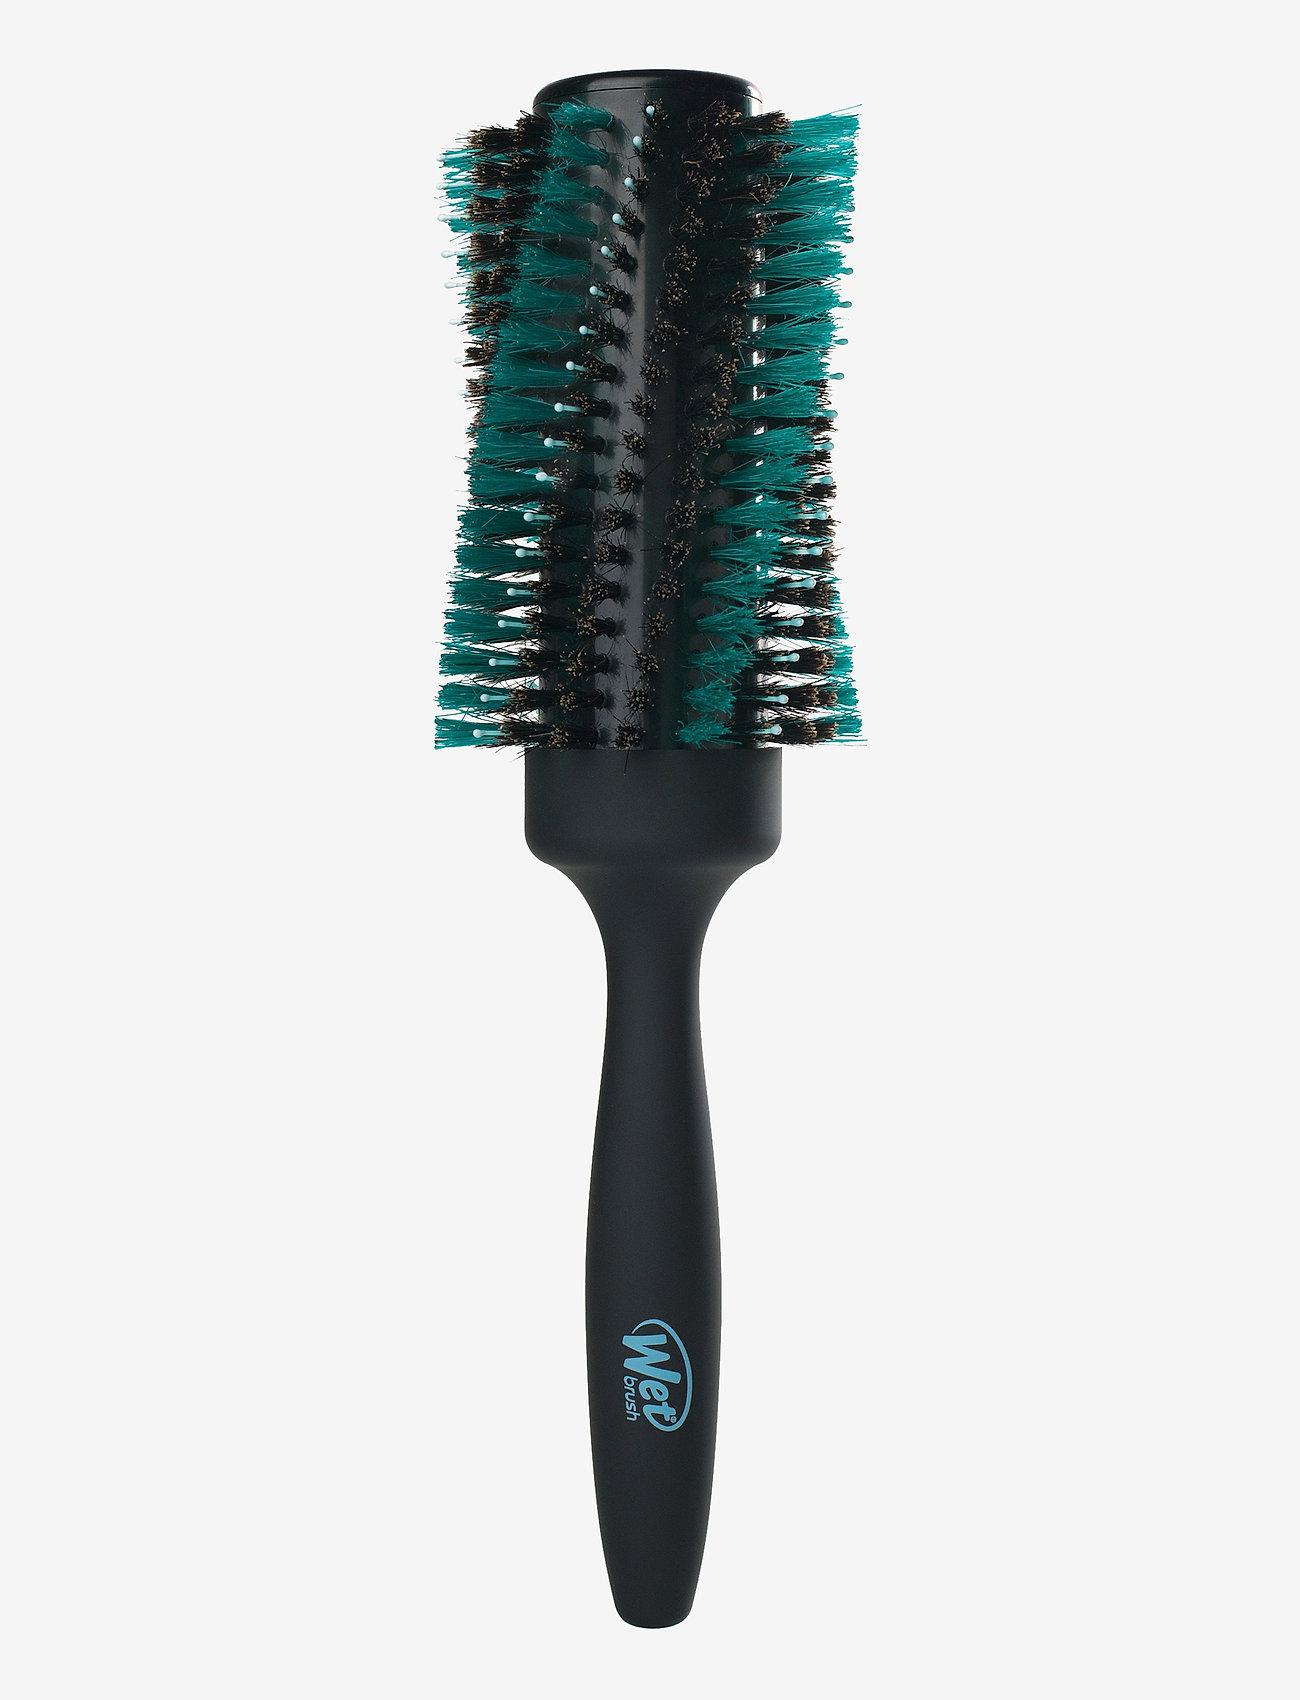 Wetbrush - Wetbrush  Roundbrush  Smooth & Shine -Thick/Course Hair - hårbørster & kammer - black - 0